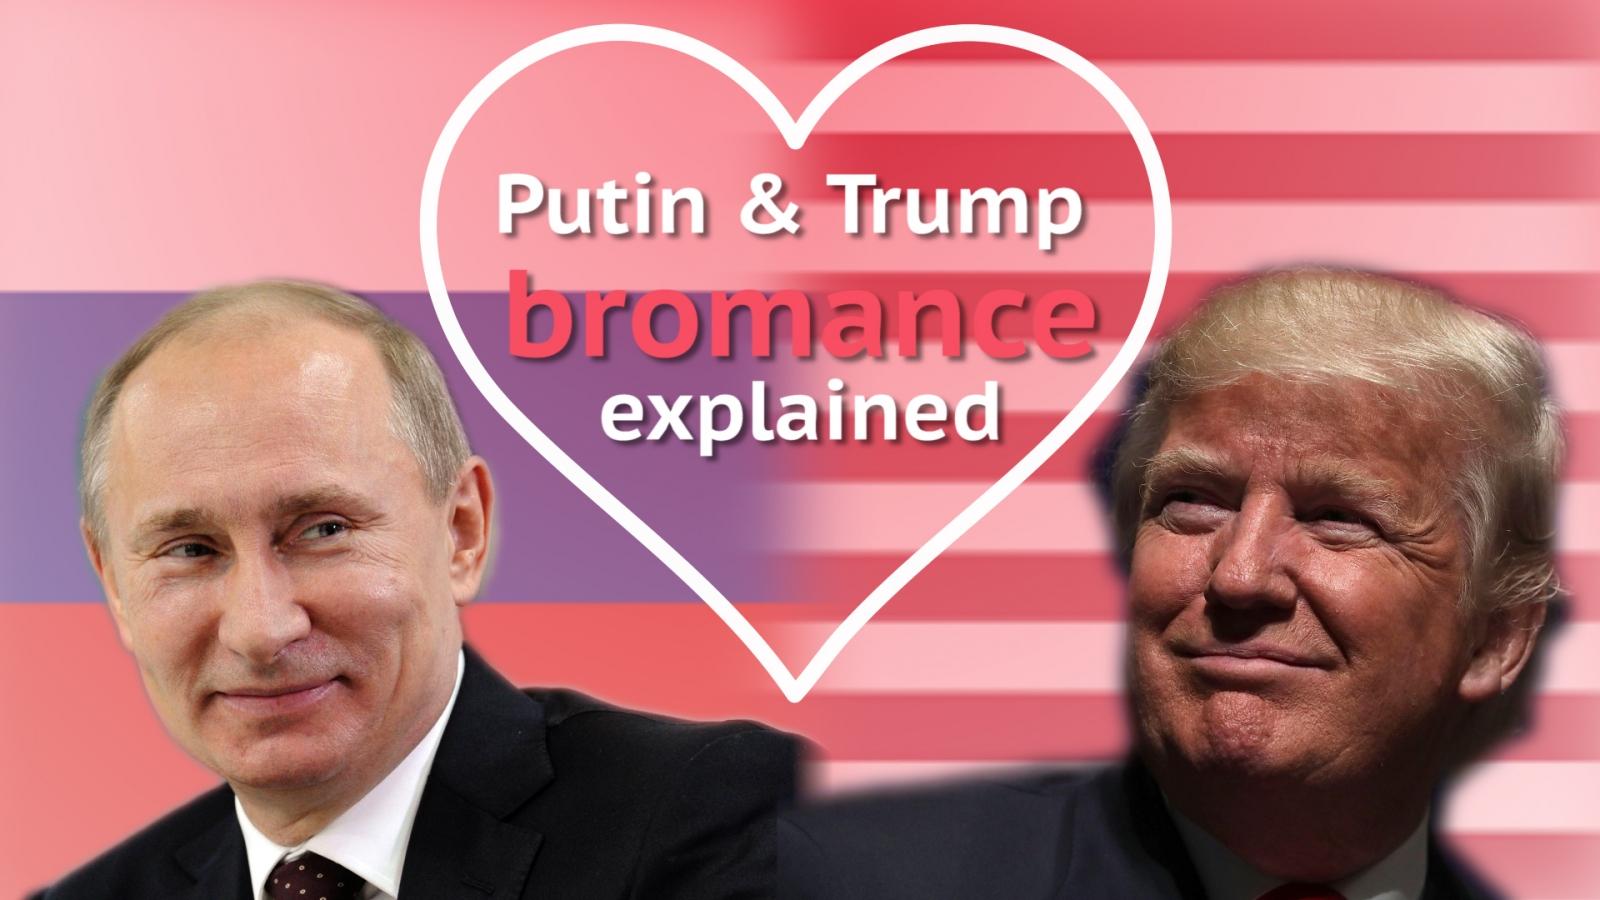 The history of Donald Trump and Vladimir Putin's bromance